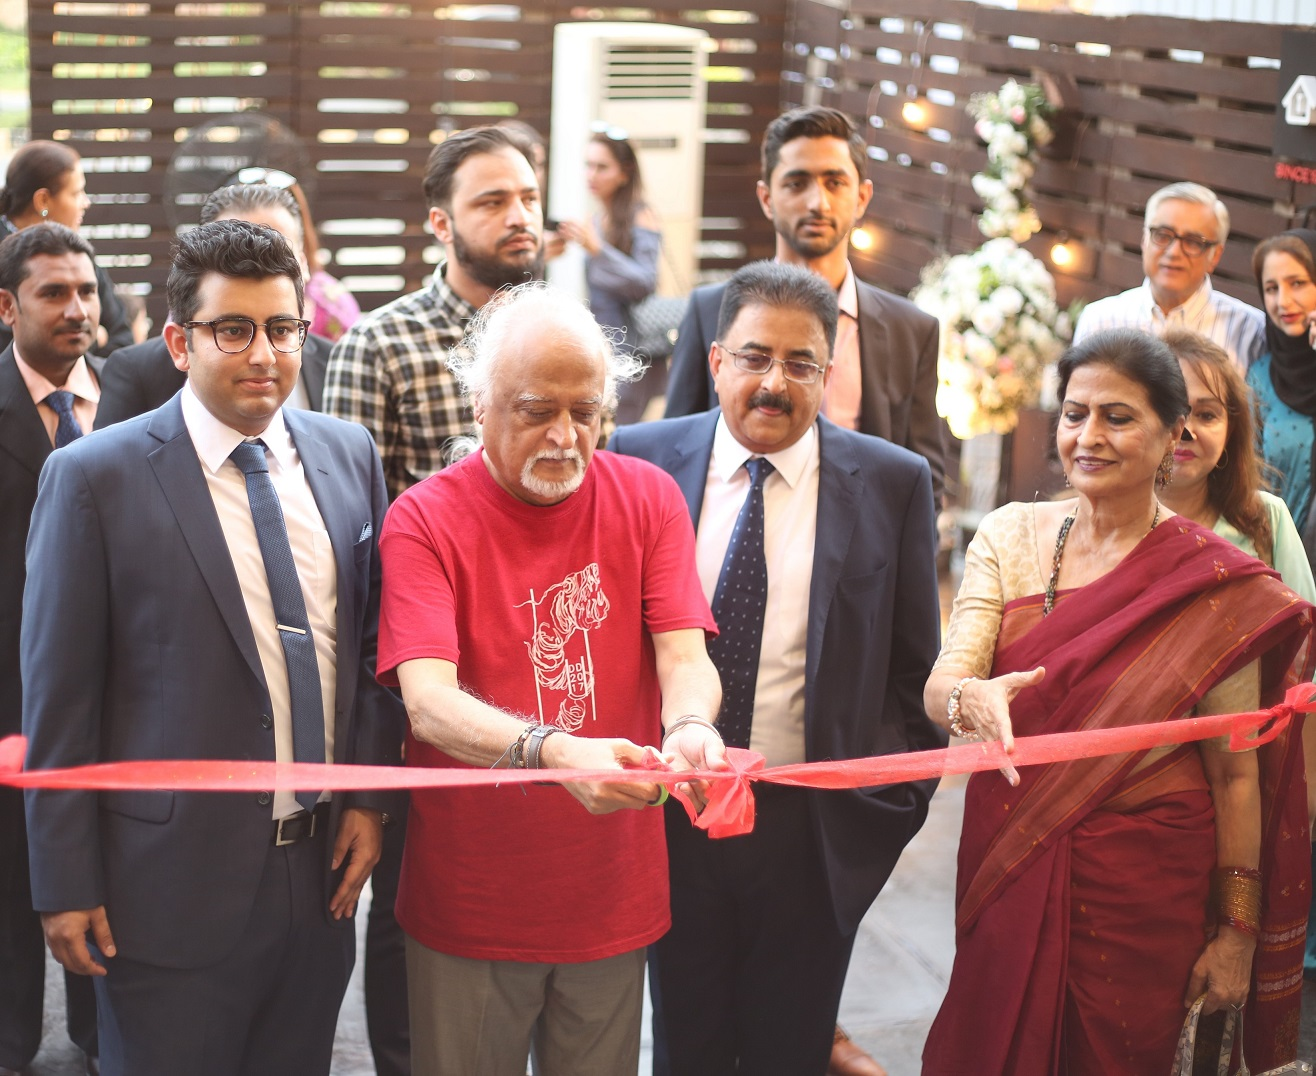 Anwar Maqsood opening J.B. Saeed Home & Hardware Store in Lahore